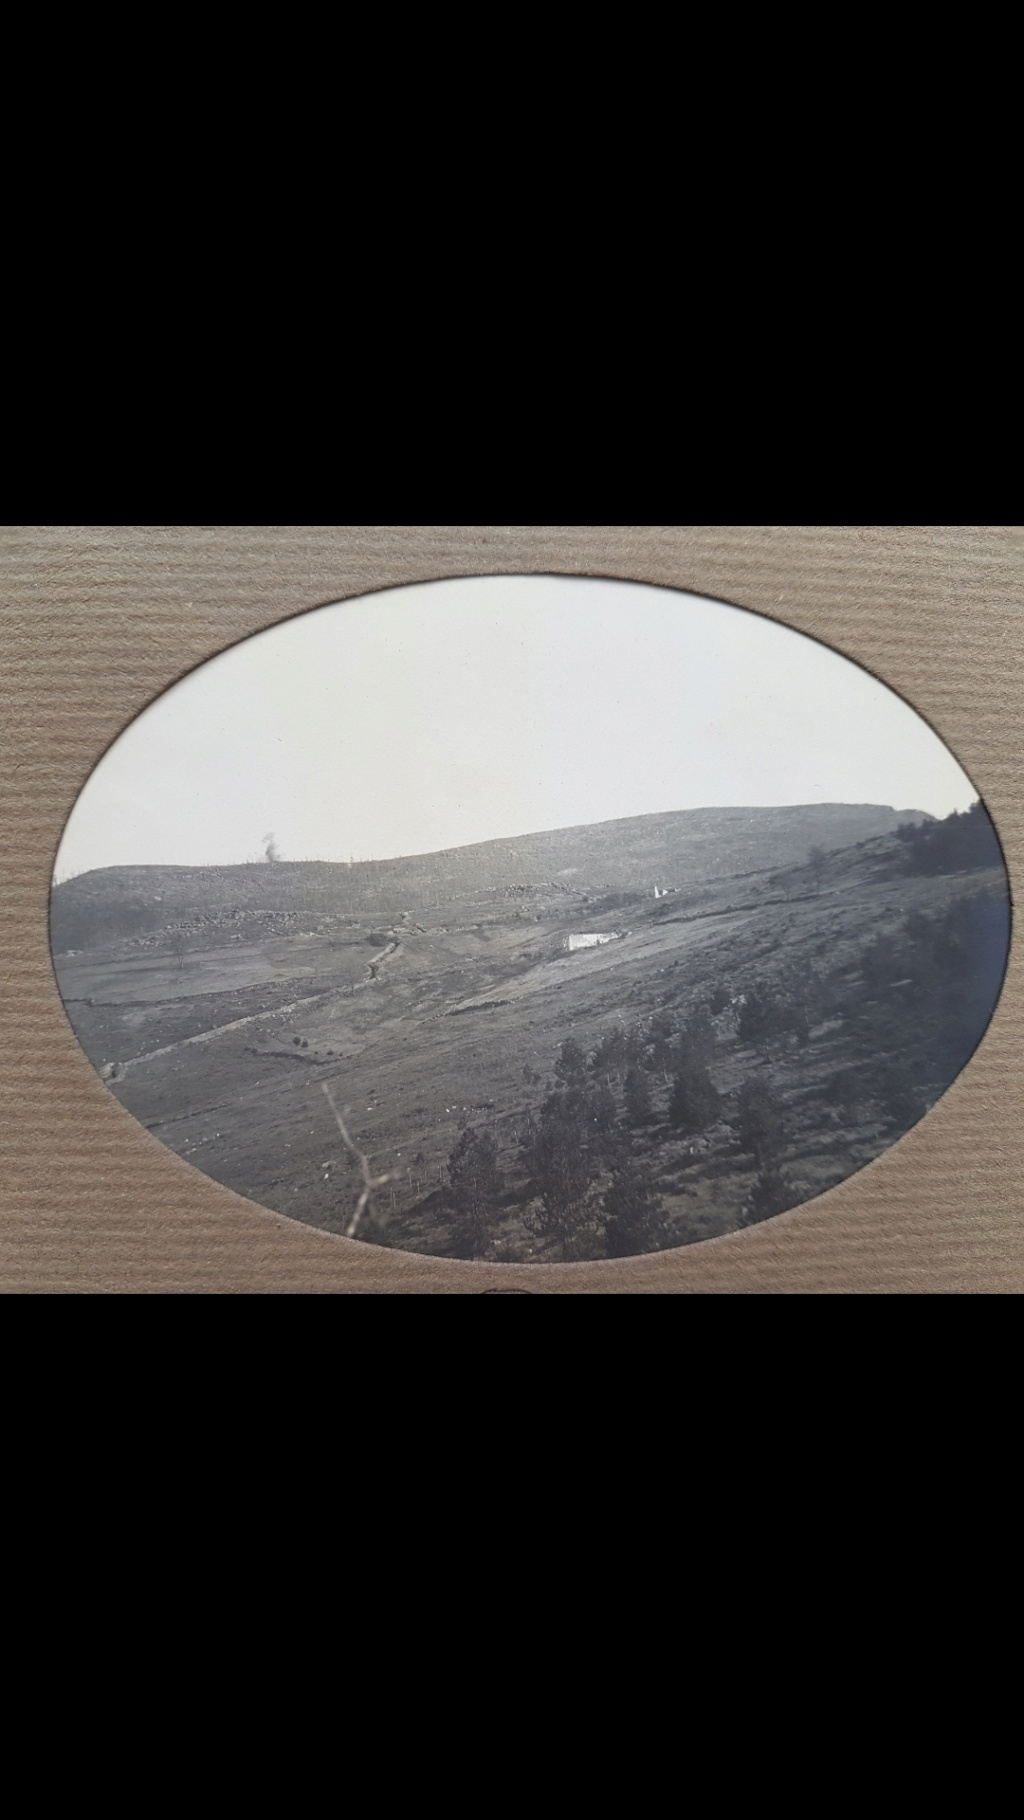 53 BCA au barrenkopf en 1916 Screen11